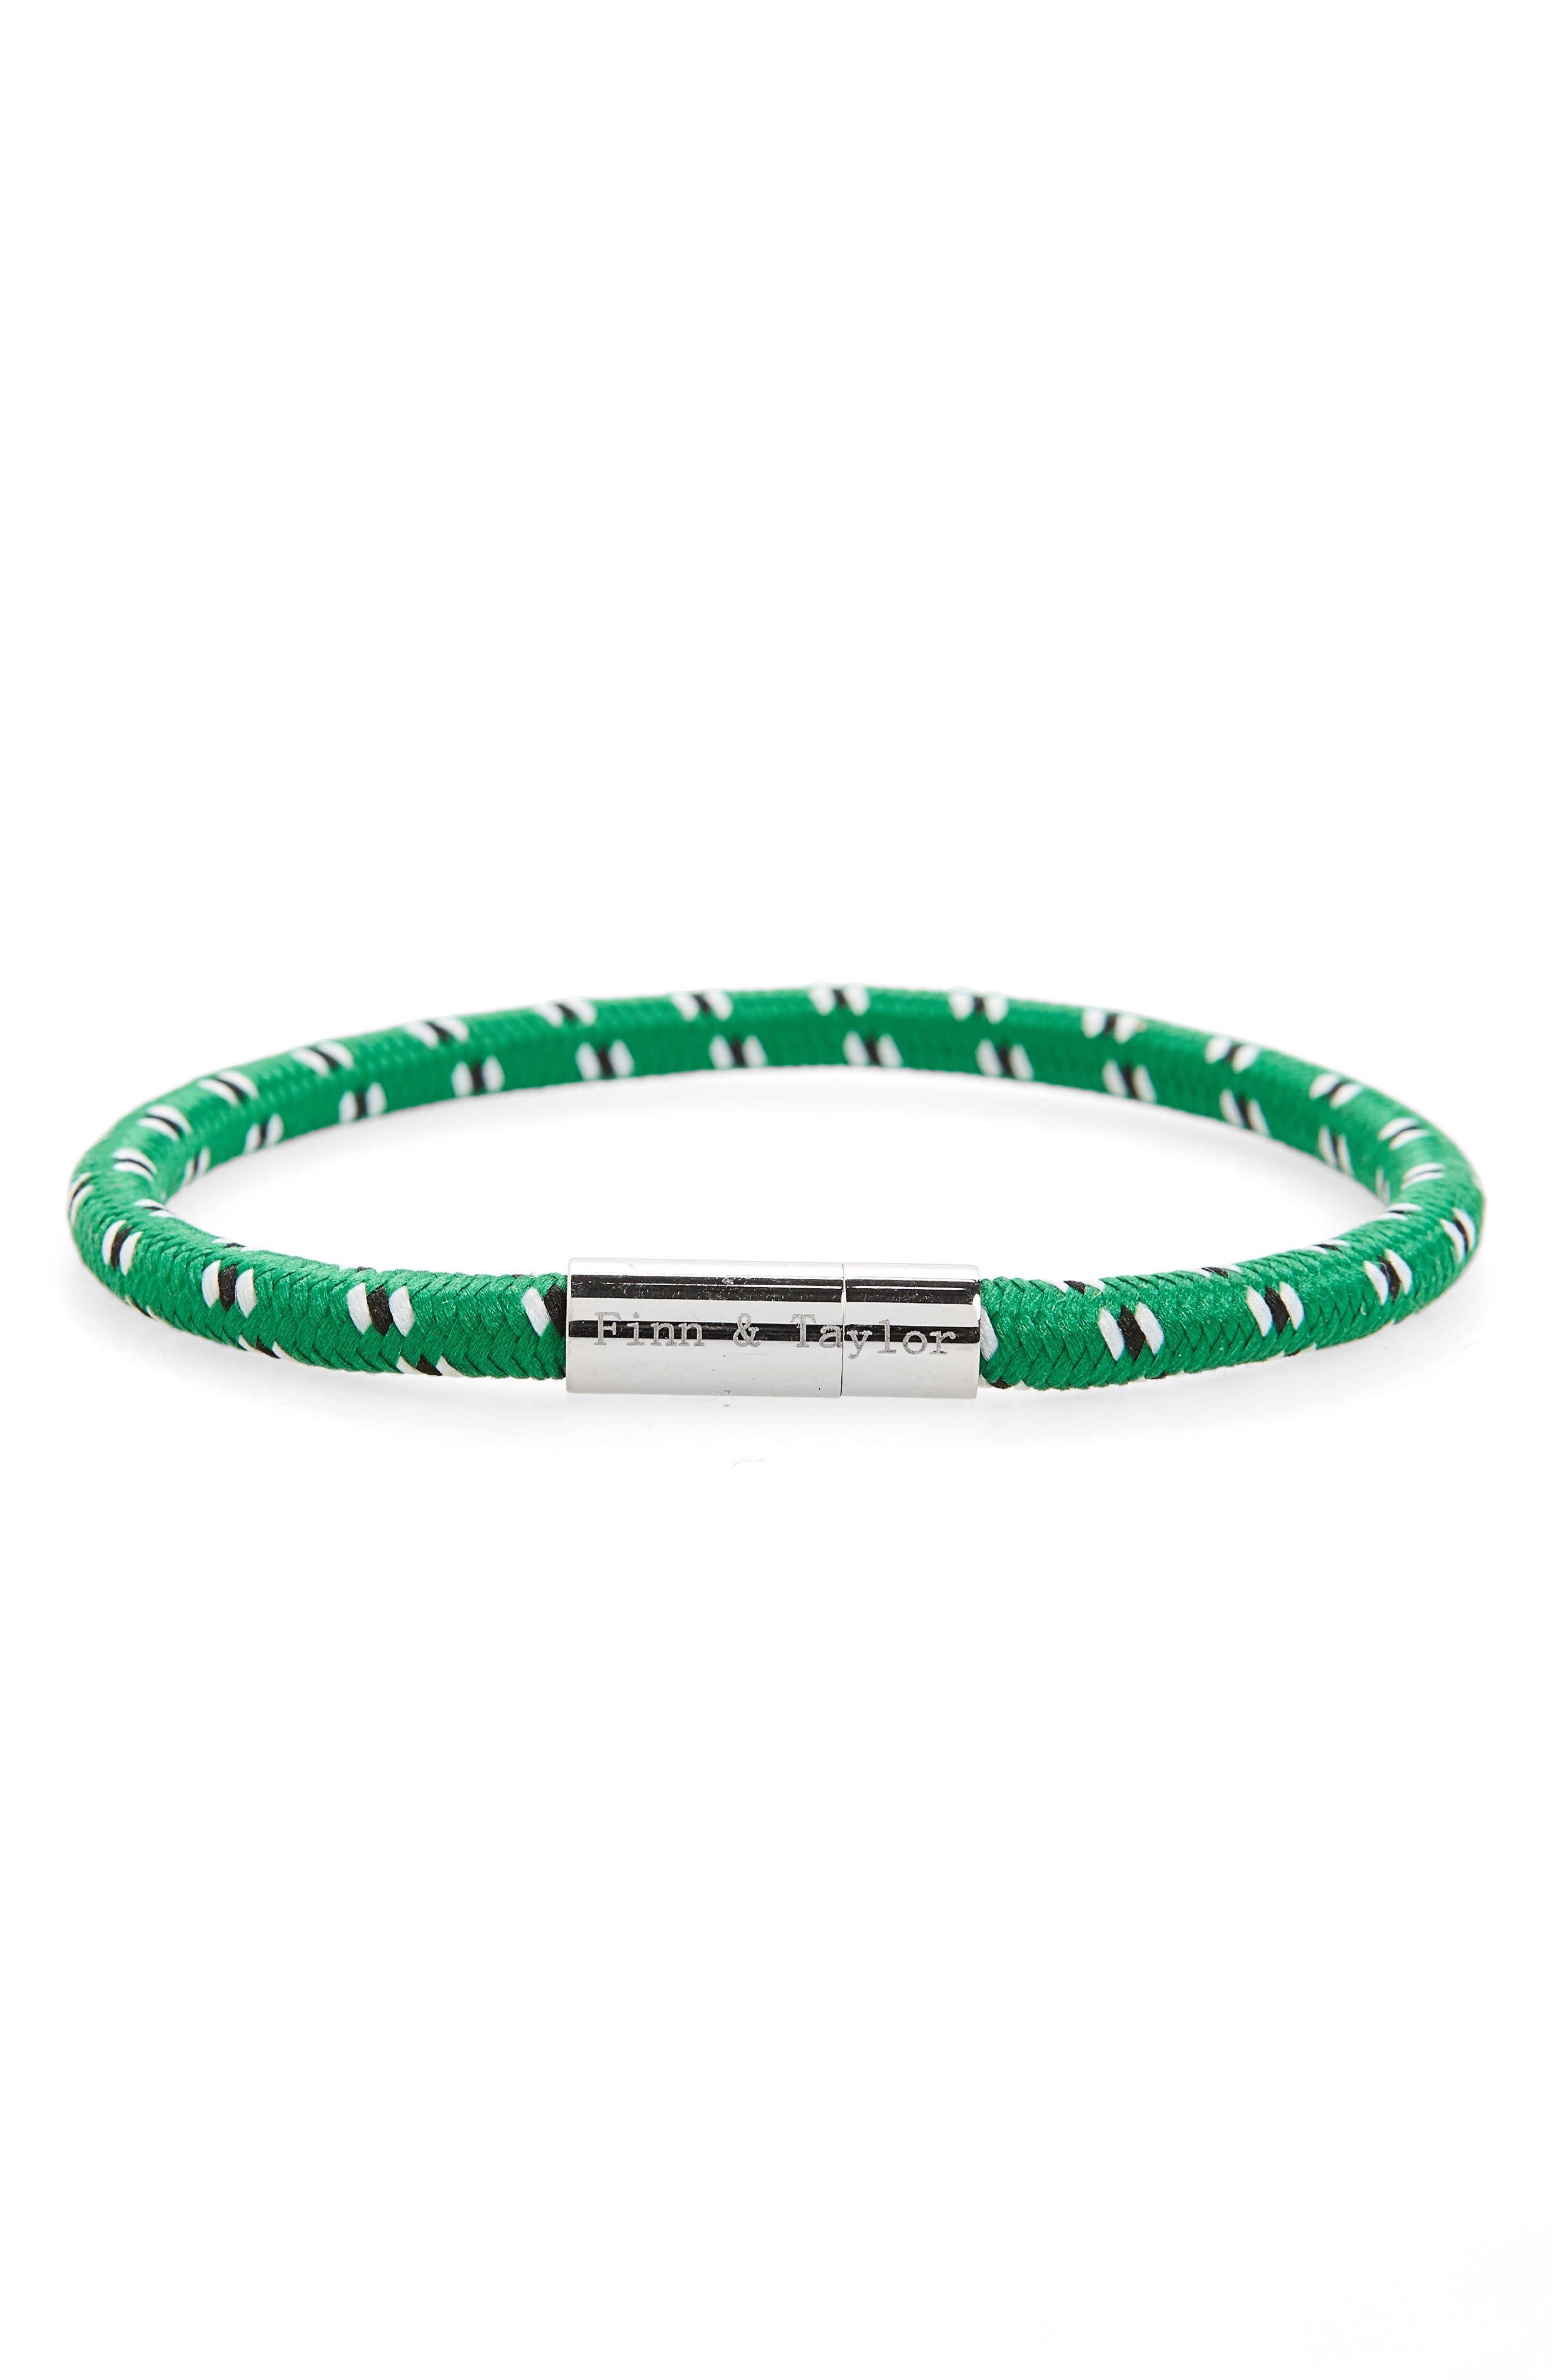 Finn & Taylor Elastic Bracelet,                             Main thumbnail 1, color,                             Green